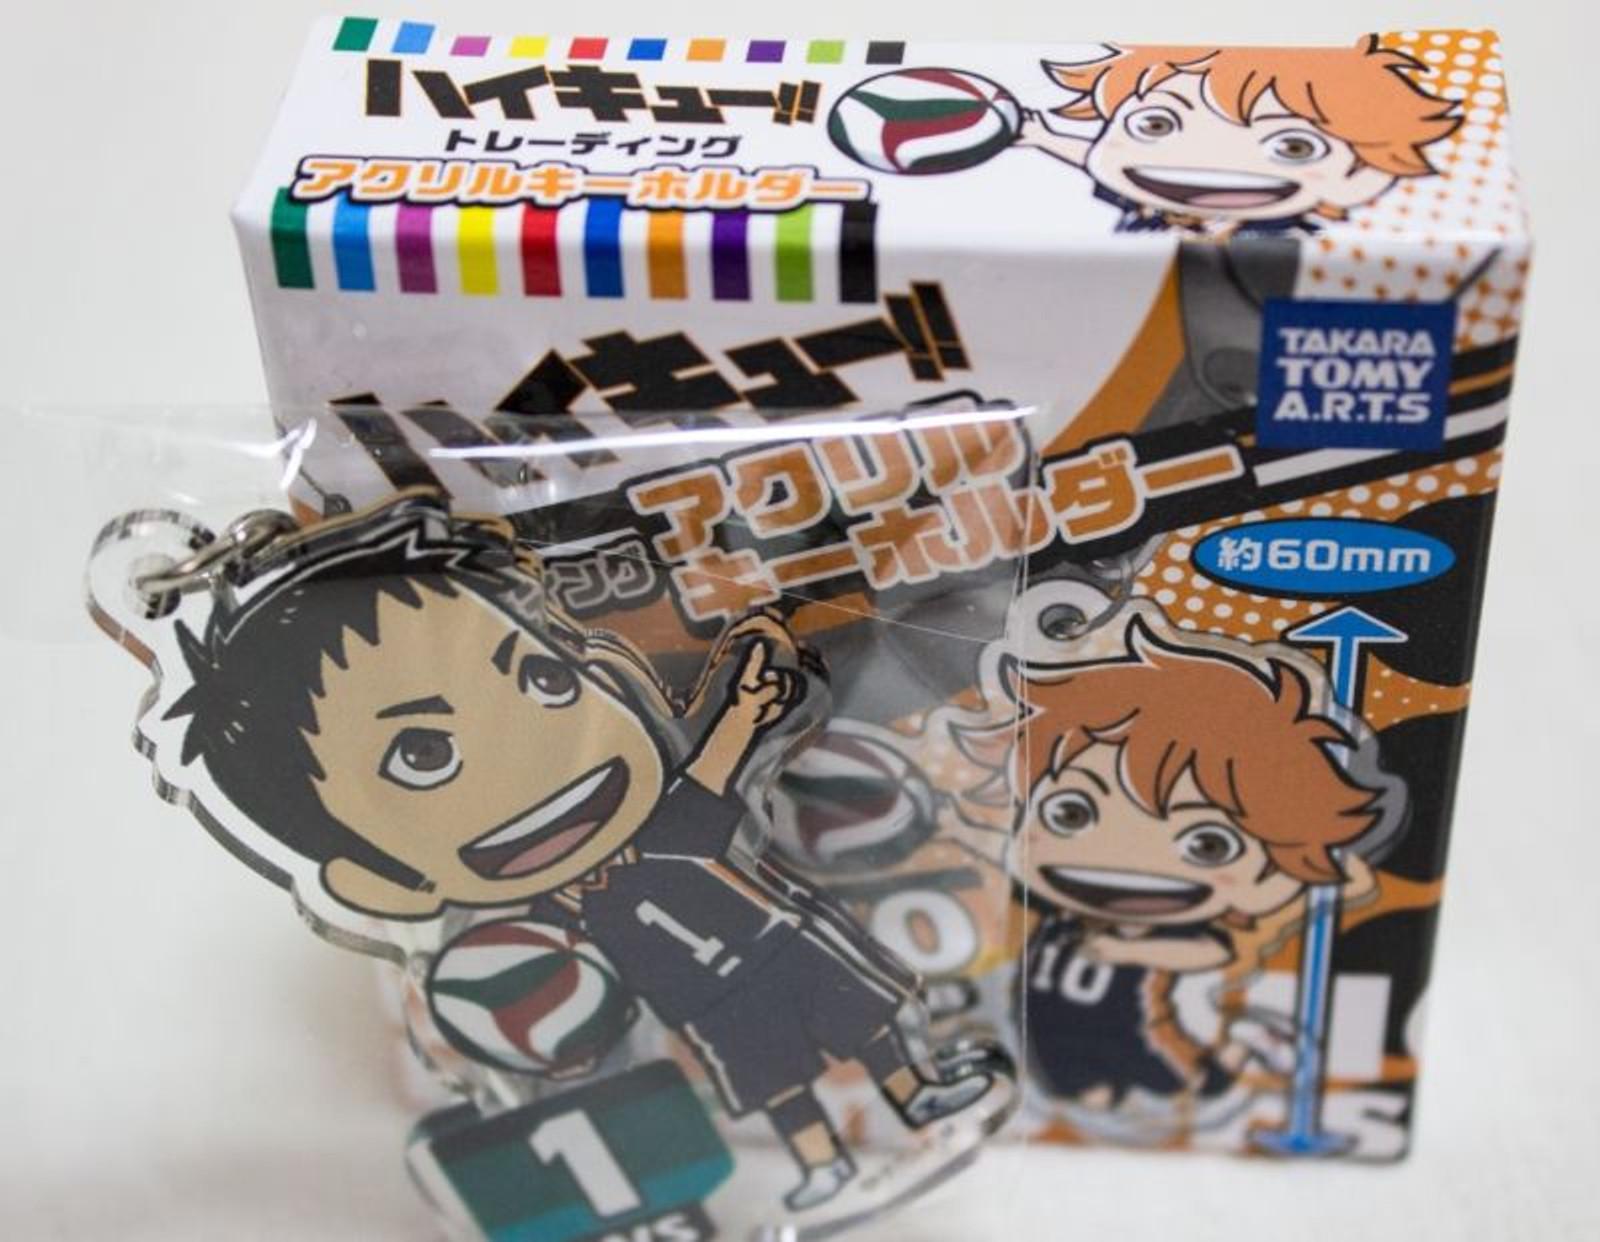 Haikyu!! Daichi Sawamura Trading Acrylic Key Chain TAKARA TOMY JAPAN ANIME